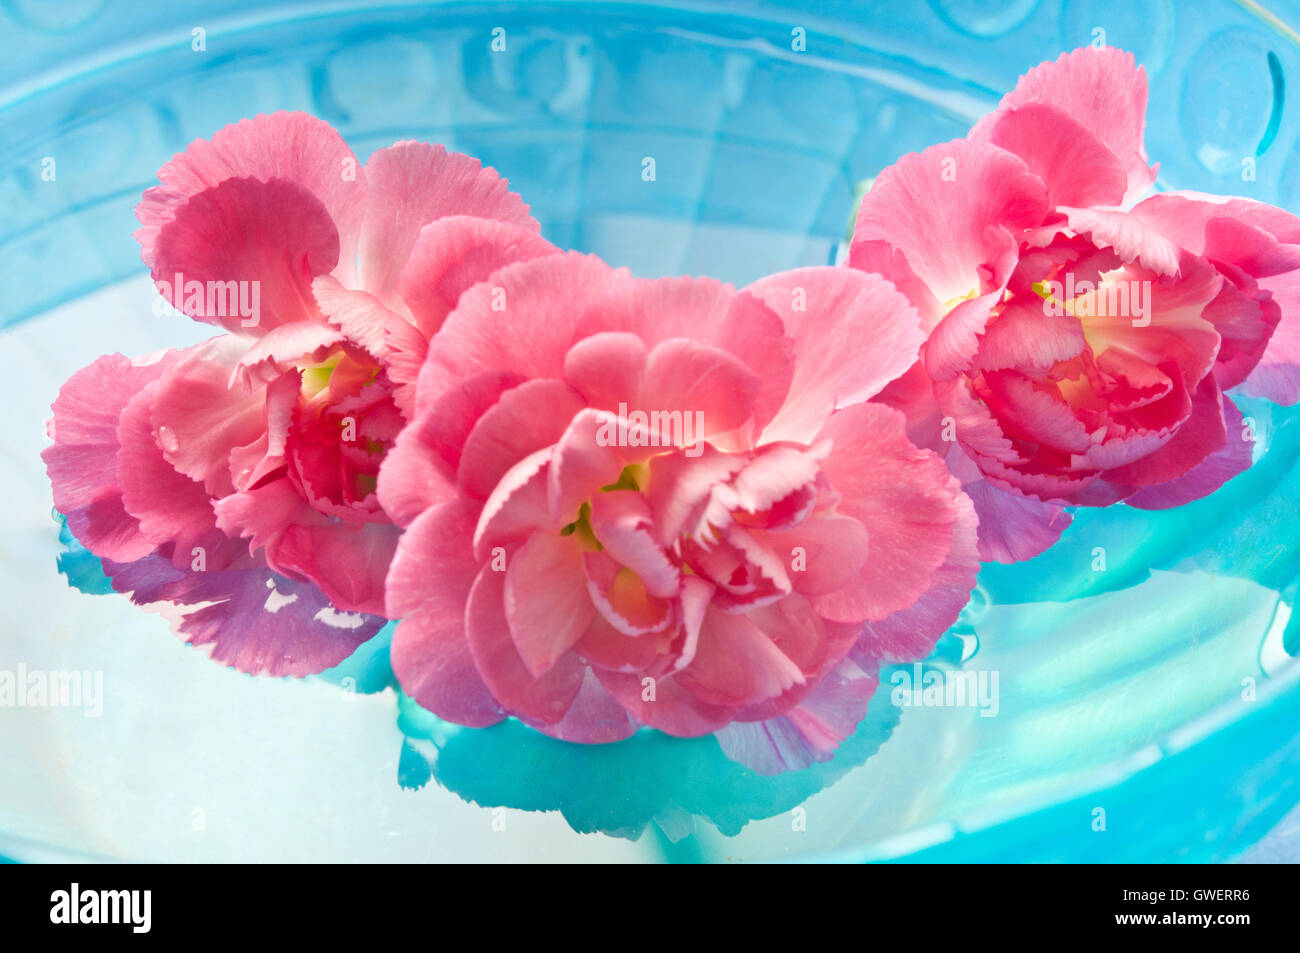 Rosa Nelken in Wasser, Meditation und Achtsamkeit Stockbild